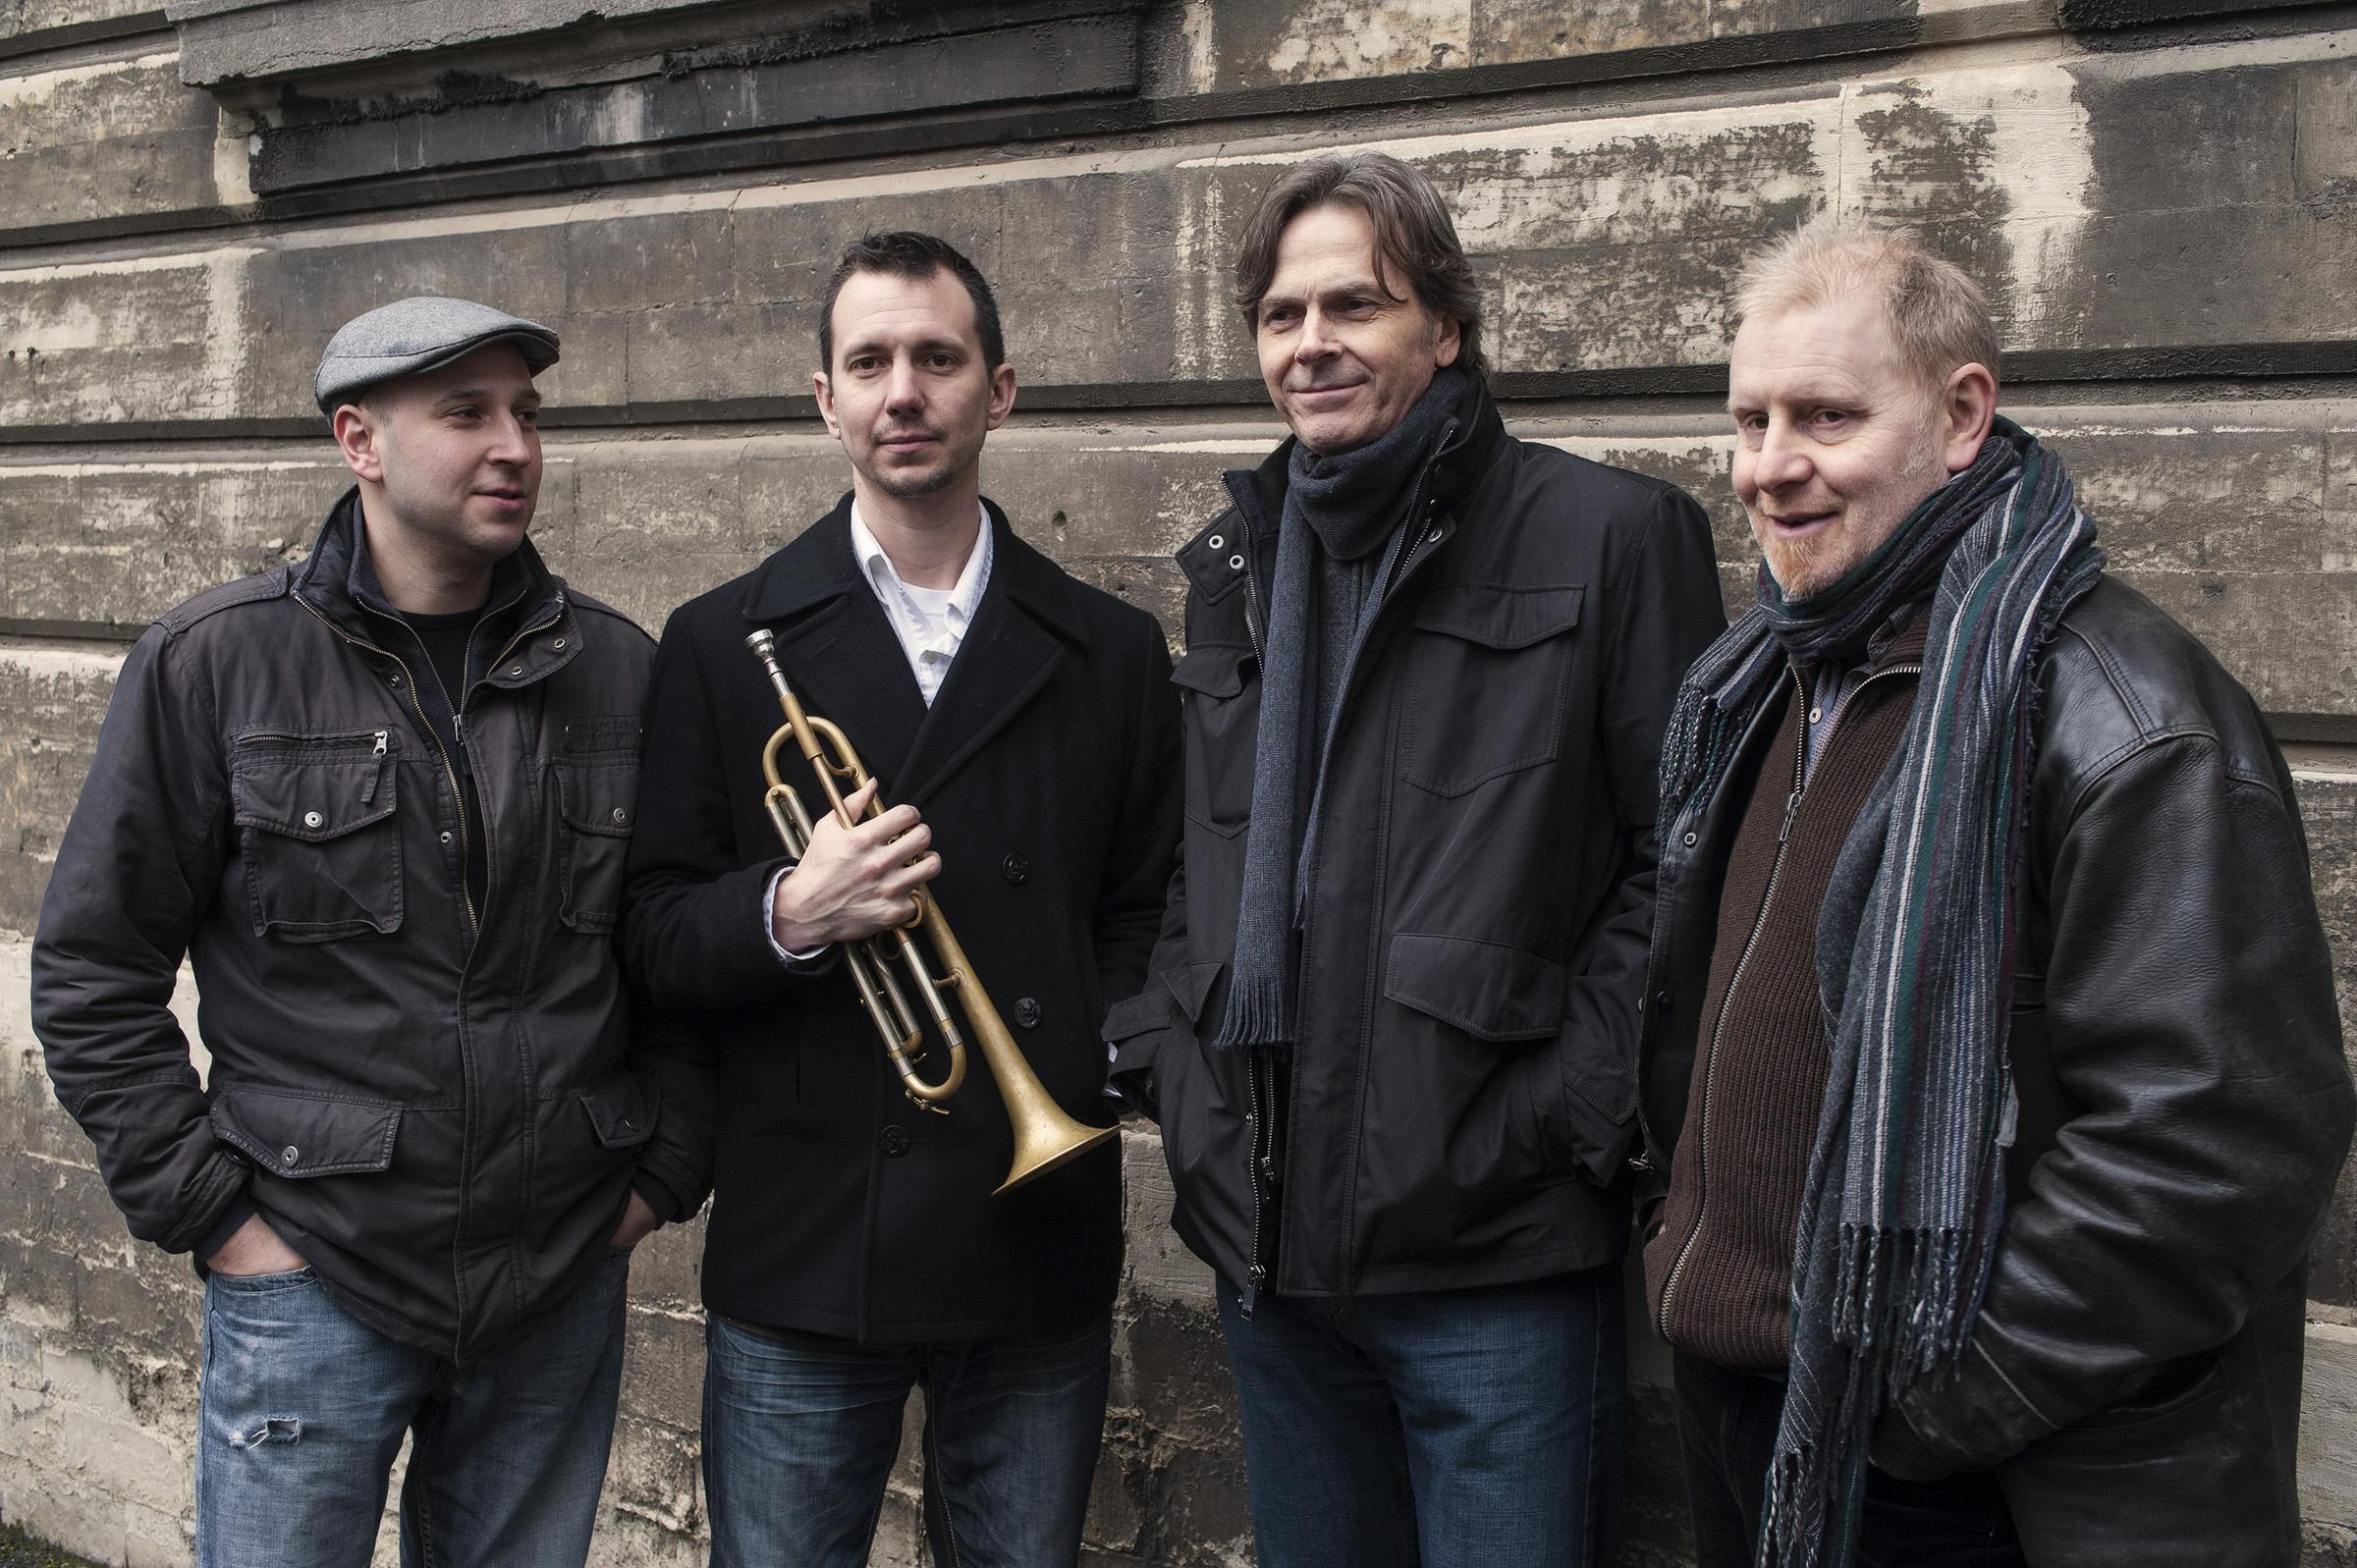 Bram Weijters / Chad McCullough Quartet